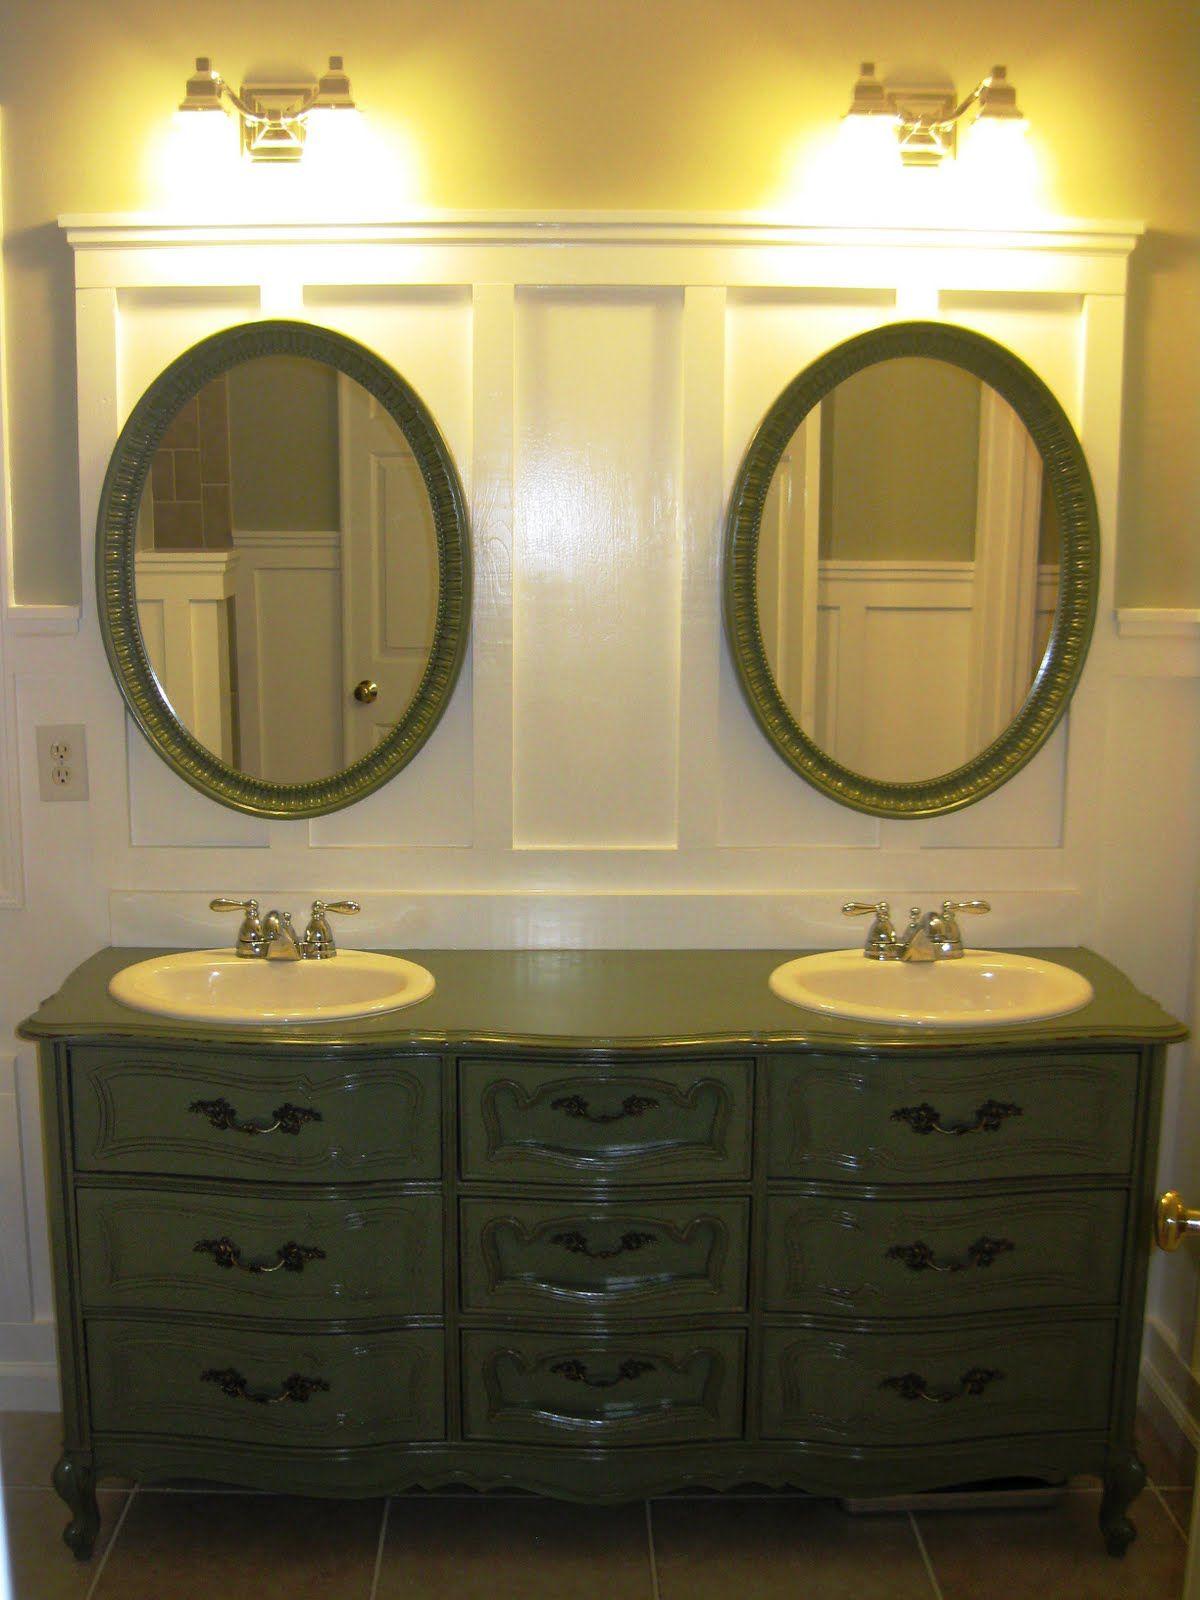 I Love Bathroom Vanities Made Out Of Old Dressers And Buffets Rustic Bathroom Vanities Trendy Bathroom Amazing Bathrooms